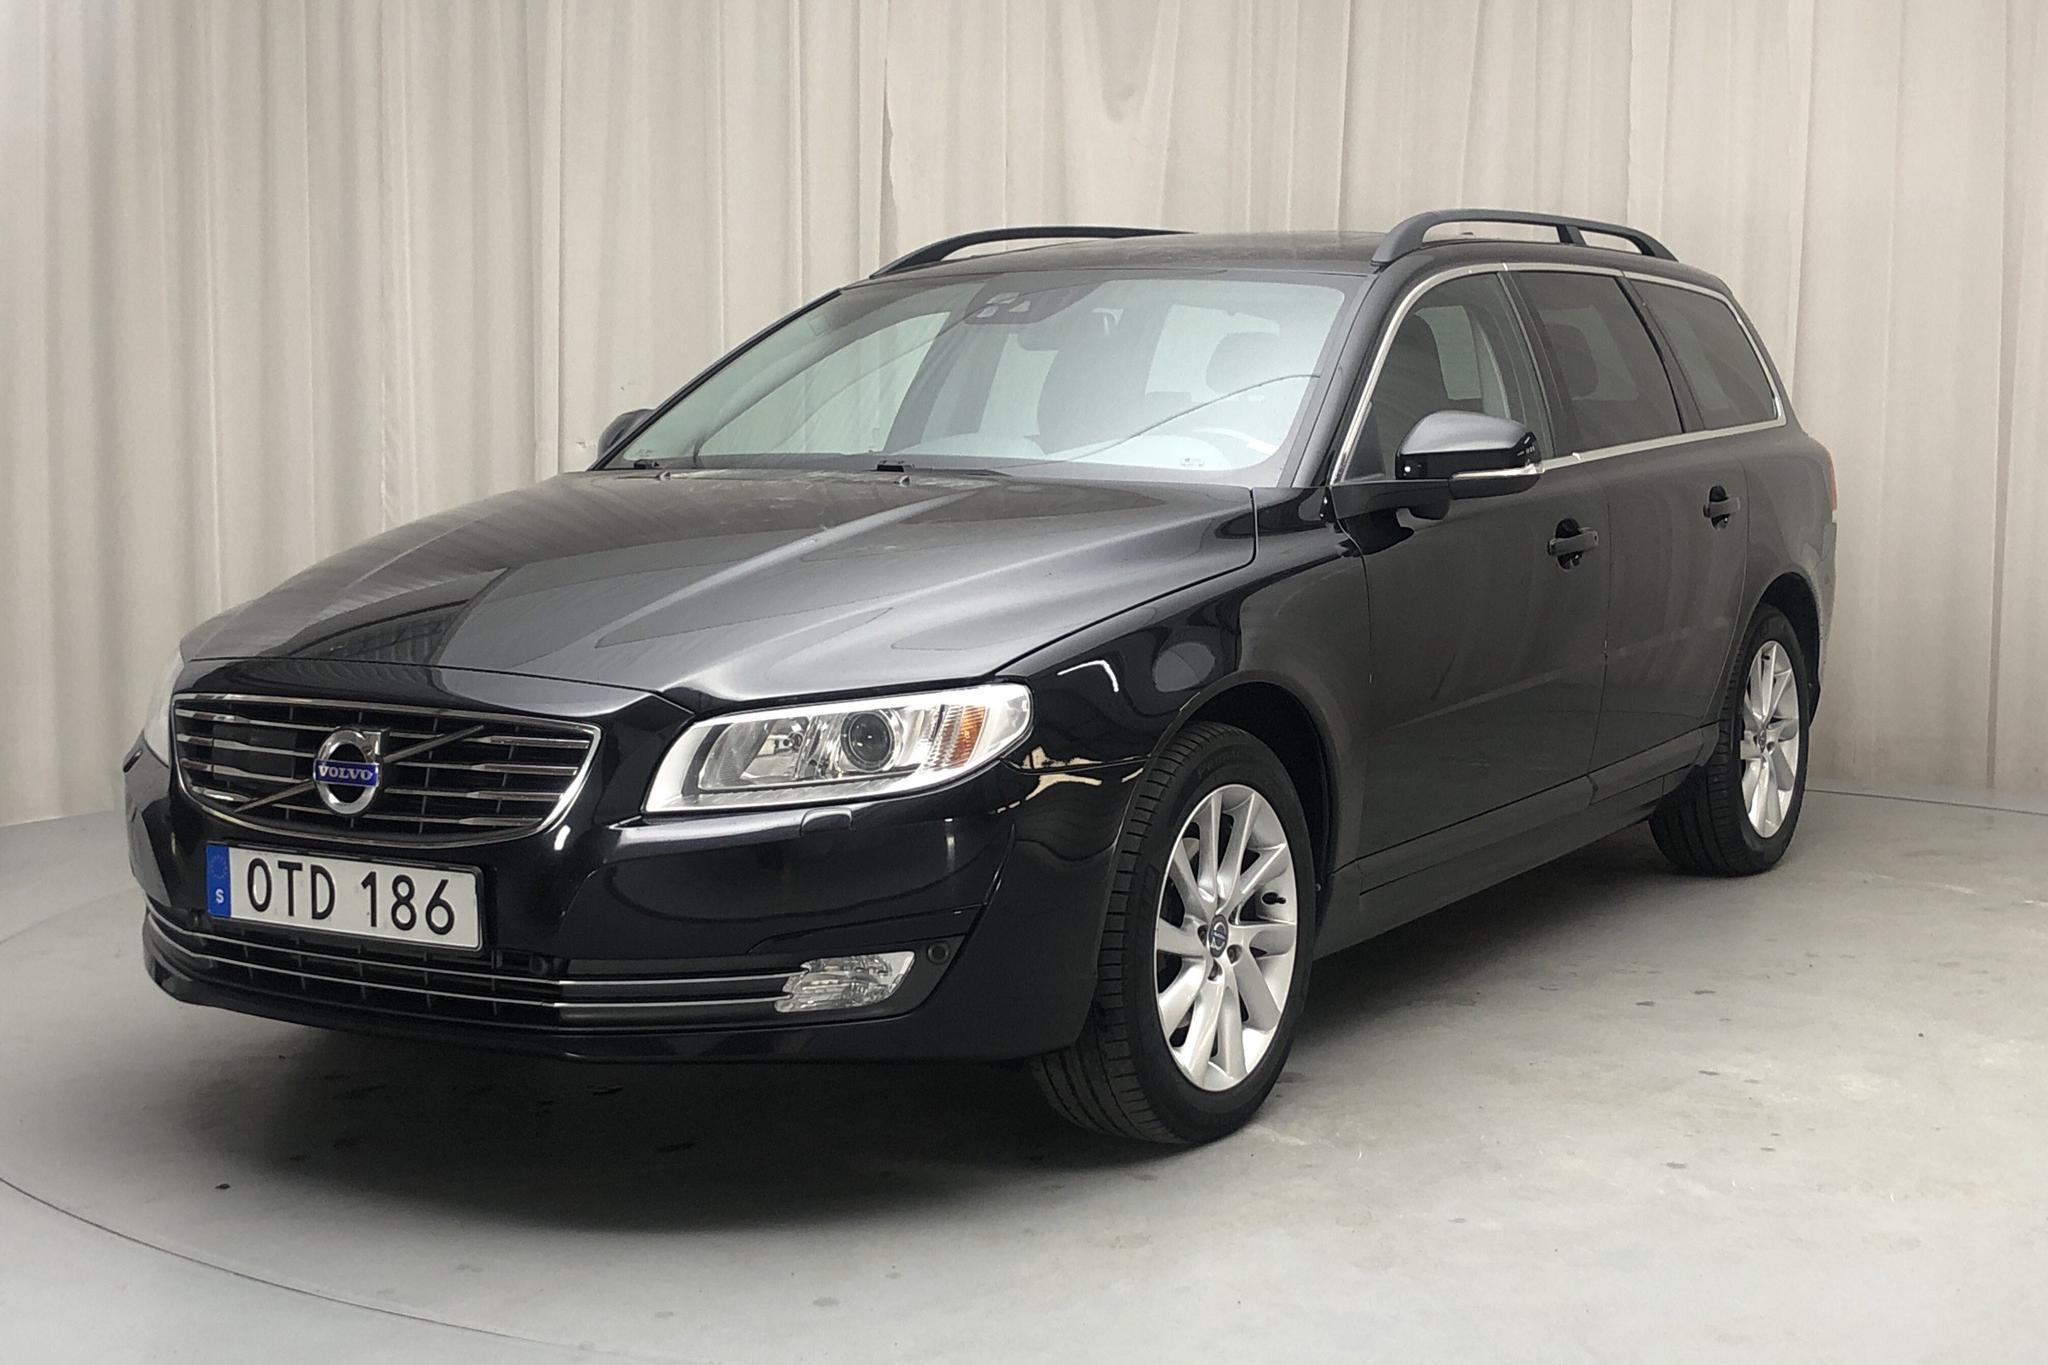 Volvo V70 II D4 (181hk) - 9 493 mil - Automat - svart - 2015